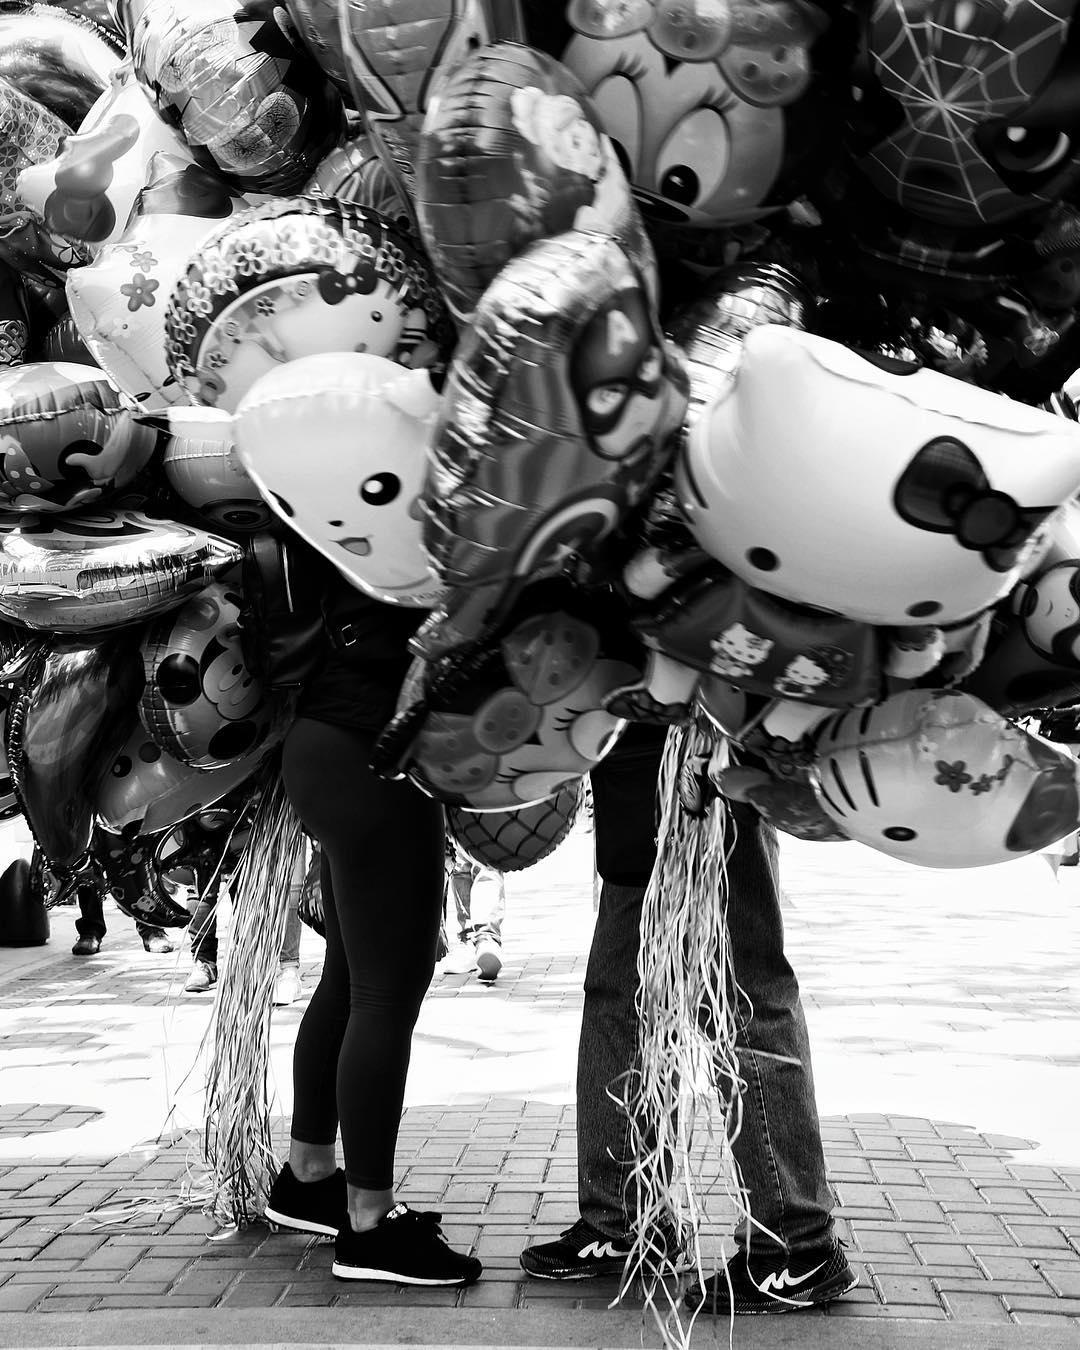 Globos #streetphotography #bnw #blackandwhite #blackandwhitephoto